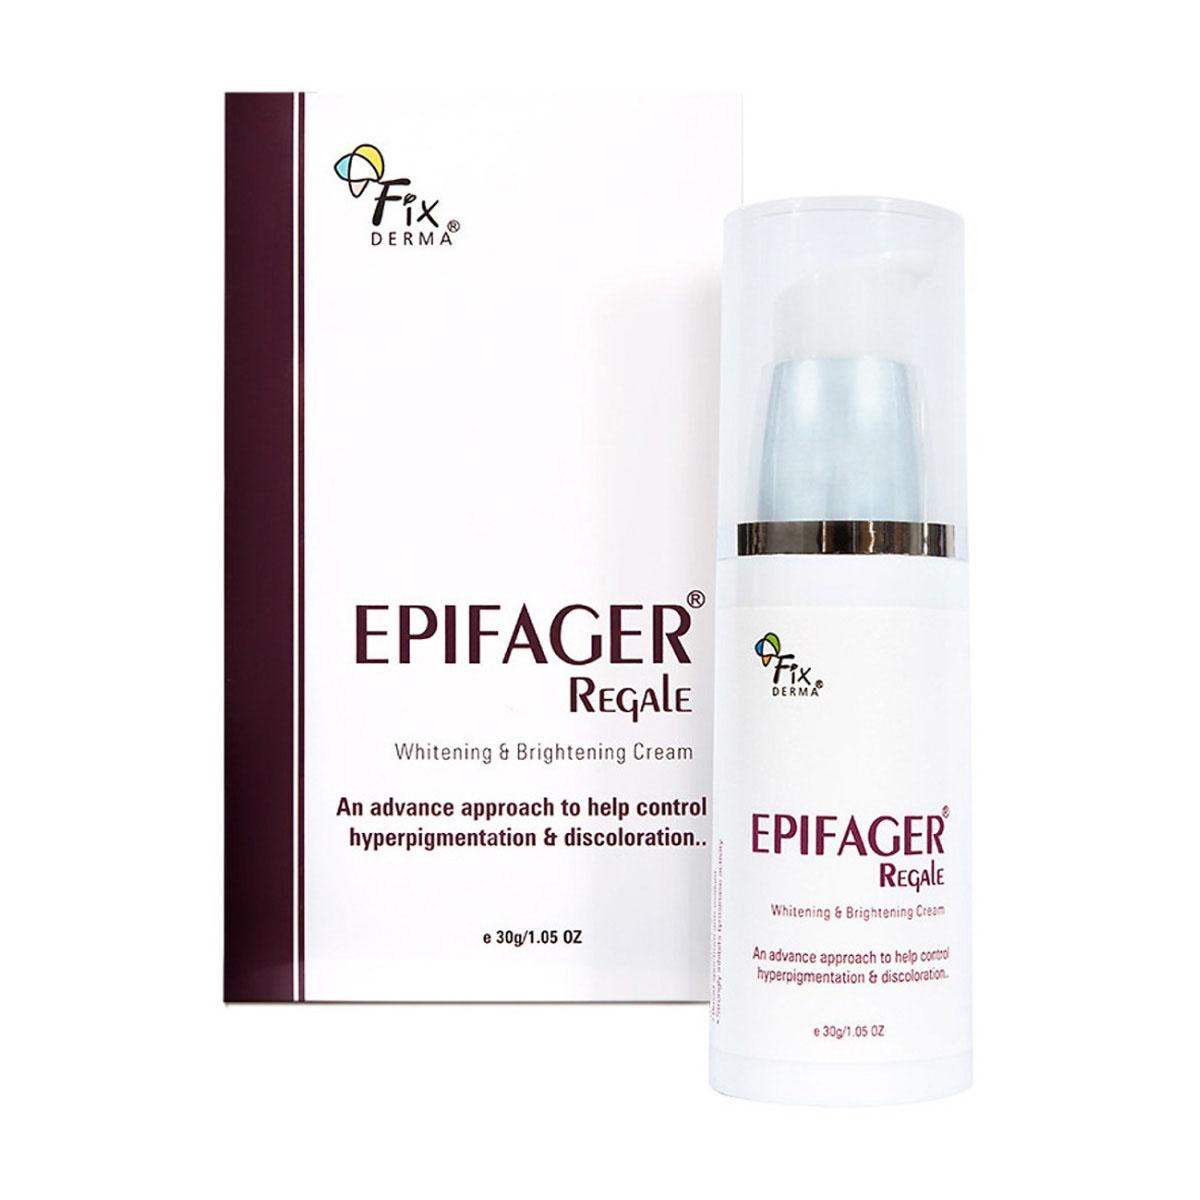 Kem Trị Nám – Trắng Da Cao Cấp Fixderma Epifager Ragale Cream (30g)